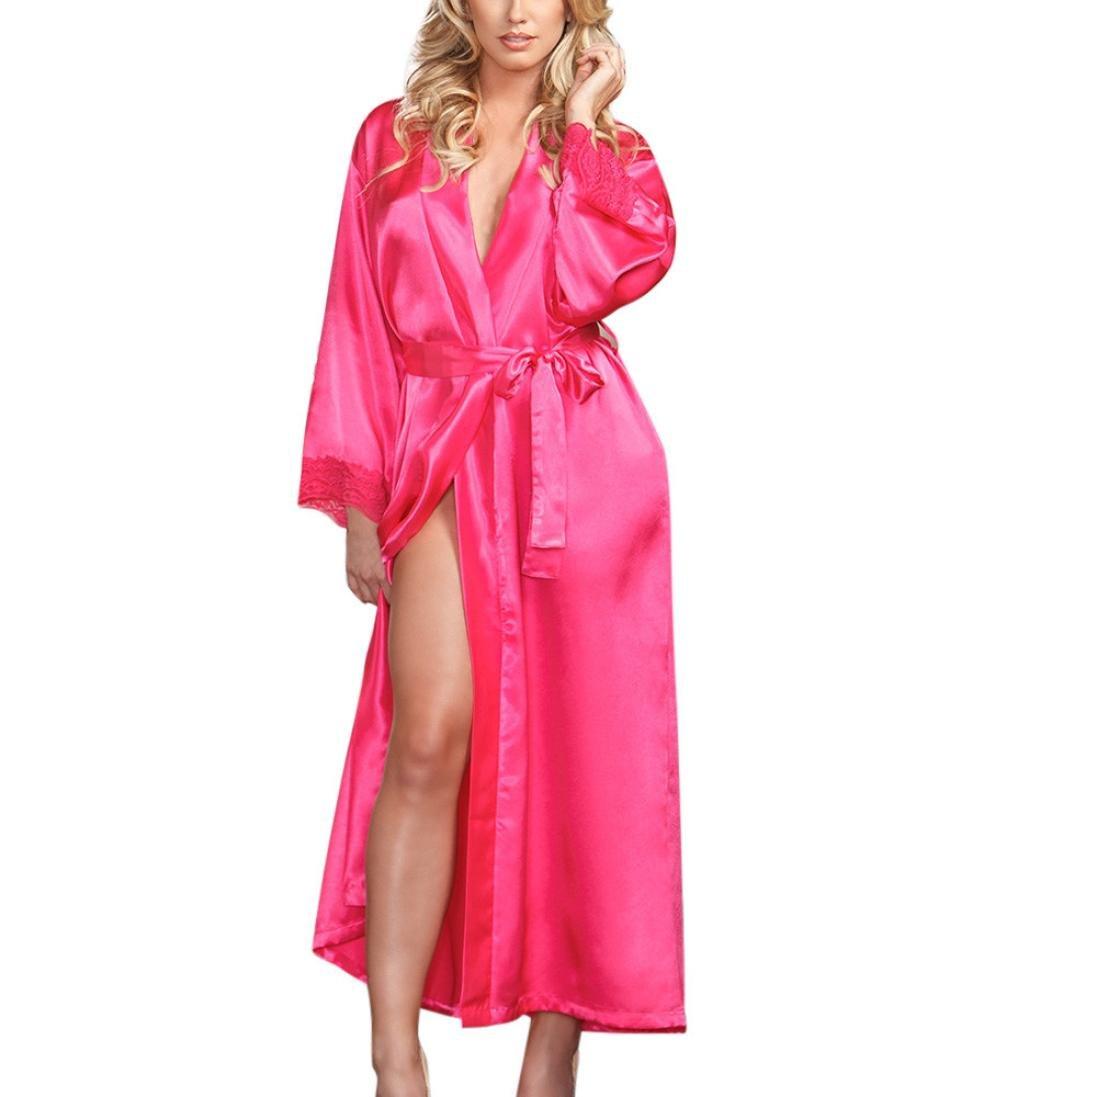 MOIKA Damen Seide Bademantel, New Frauen Lange Seide Kimono Morgenmantel Babydoll Dessous Bath Robe Unterwäsche Nachtwäsche Hot Rosa)